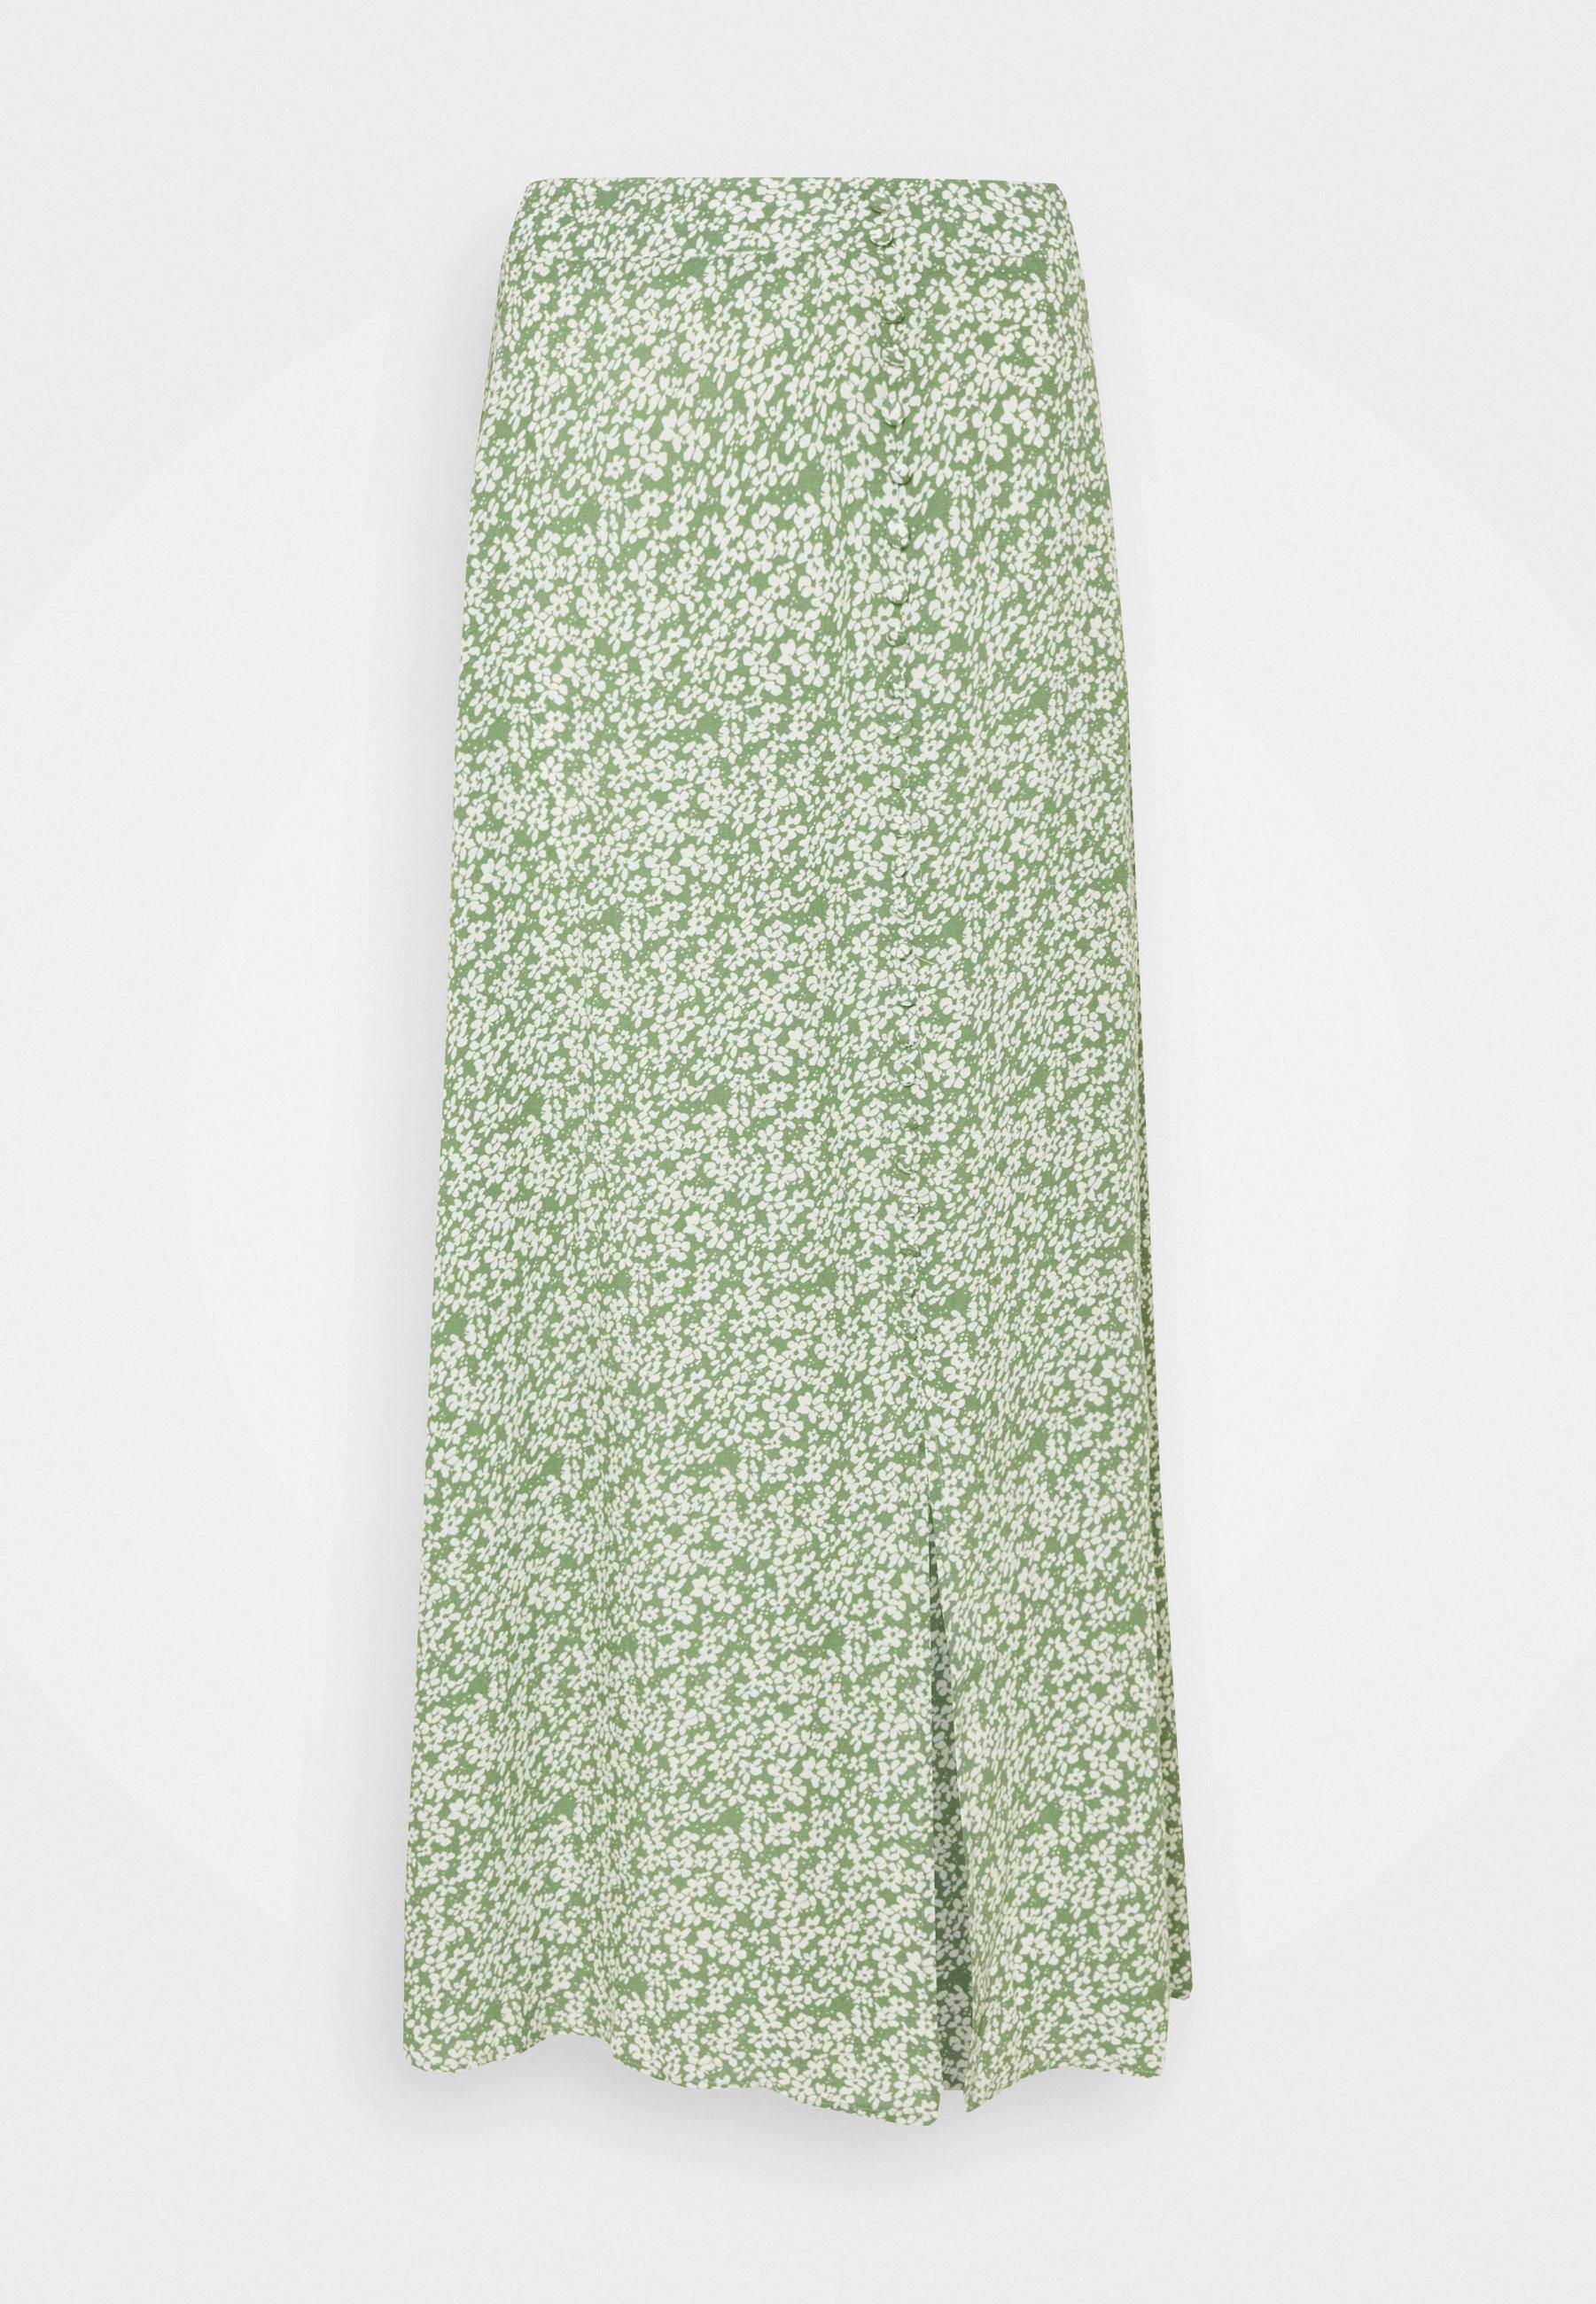 Falda midi Onladavie ivy (24,59 euros)